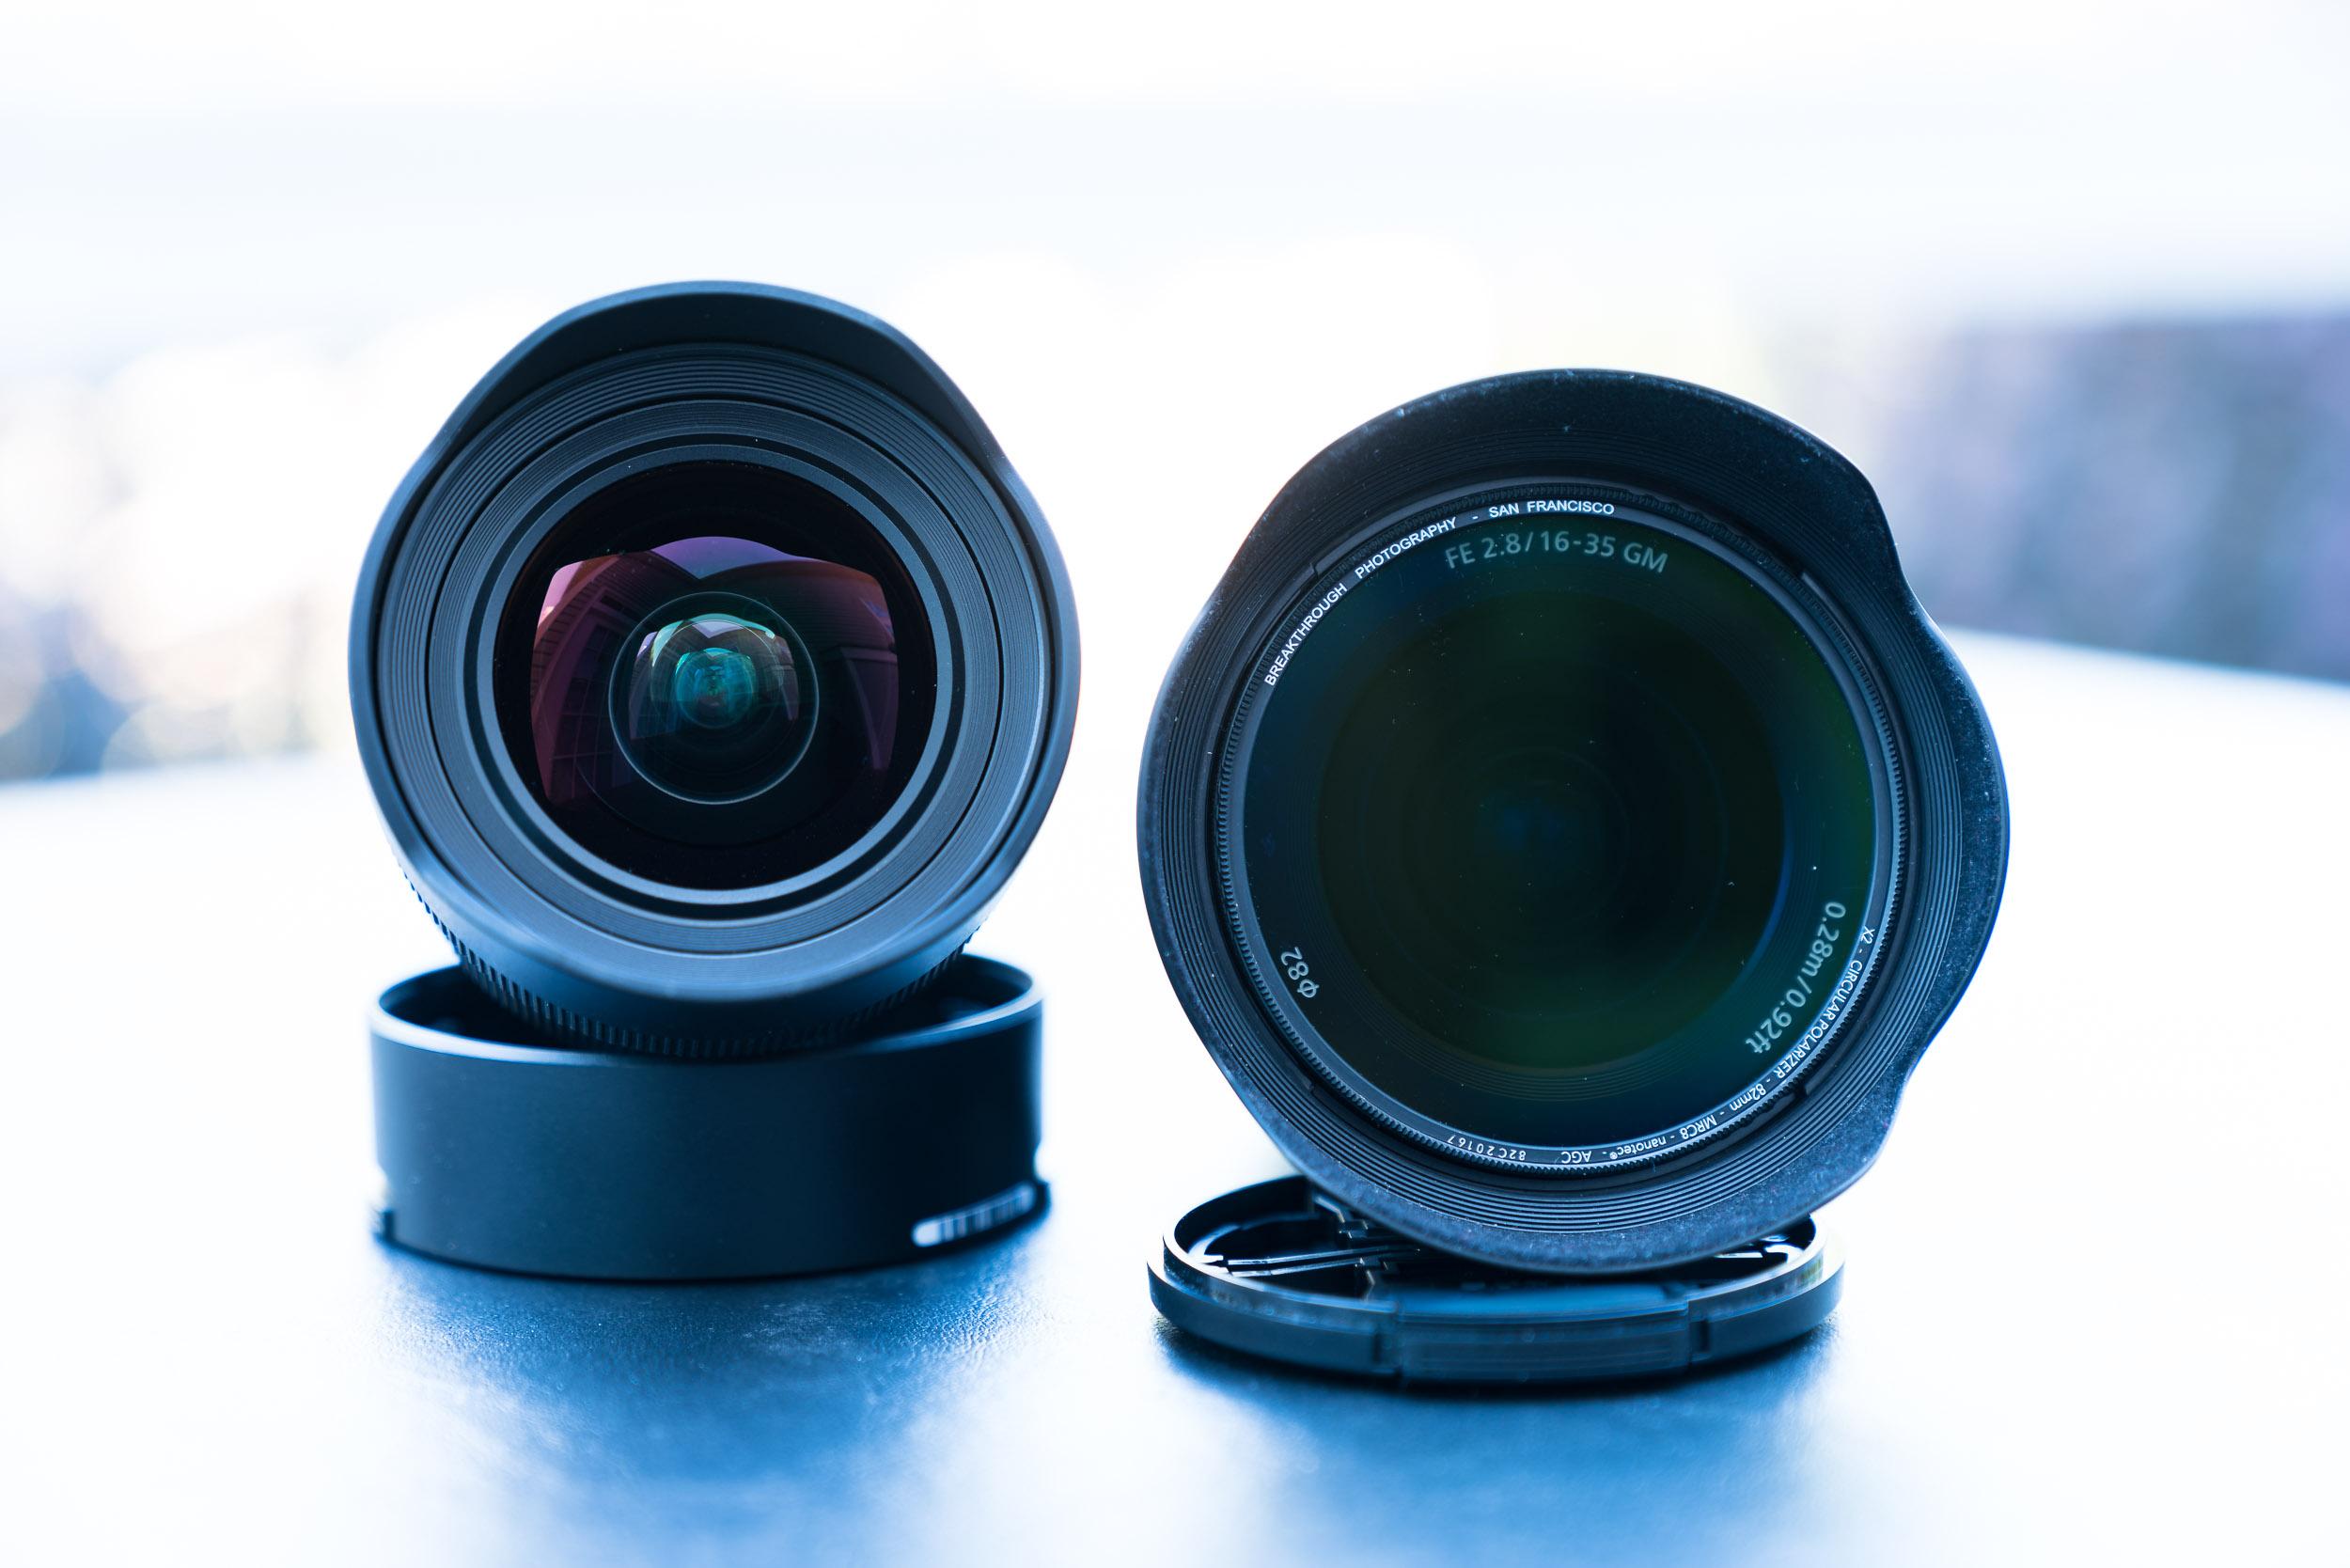 Sony 12-24mm G f/4 left, Sony 16-35mm GM f/2.8 with circular polarizer right